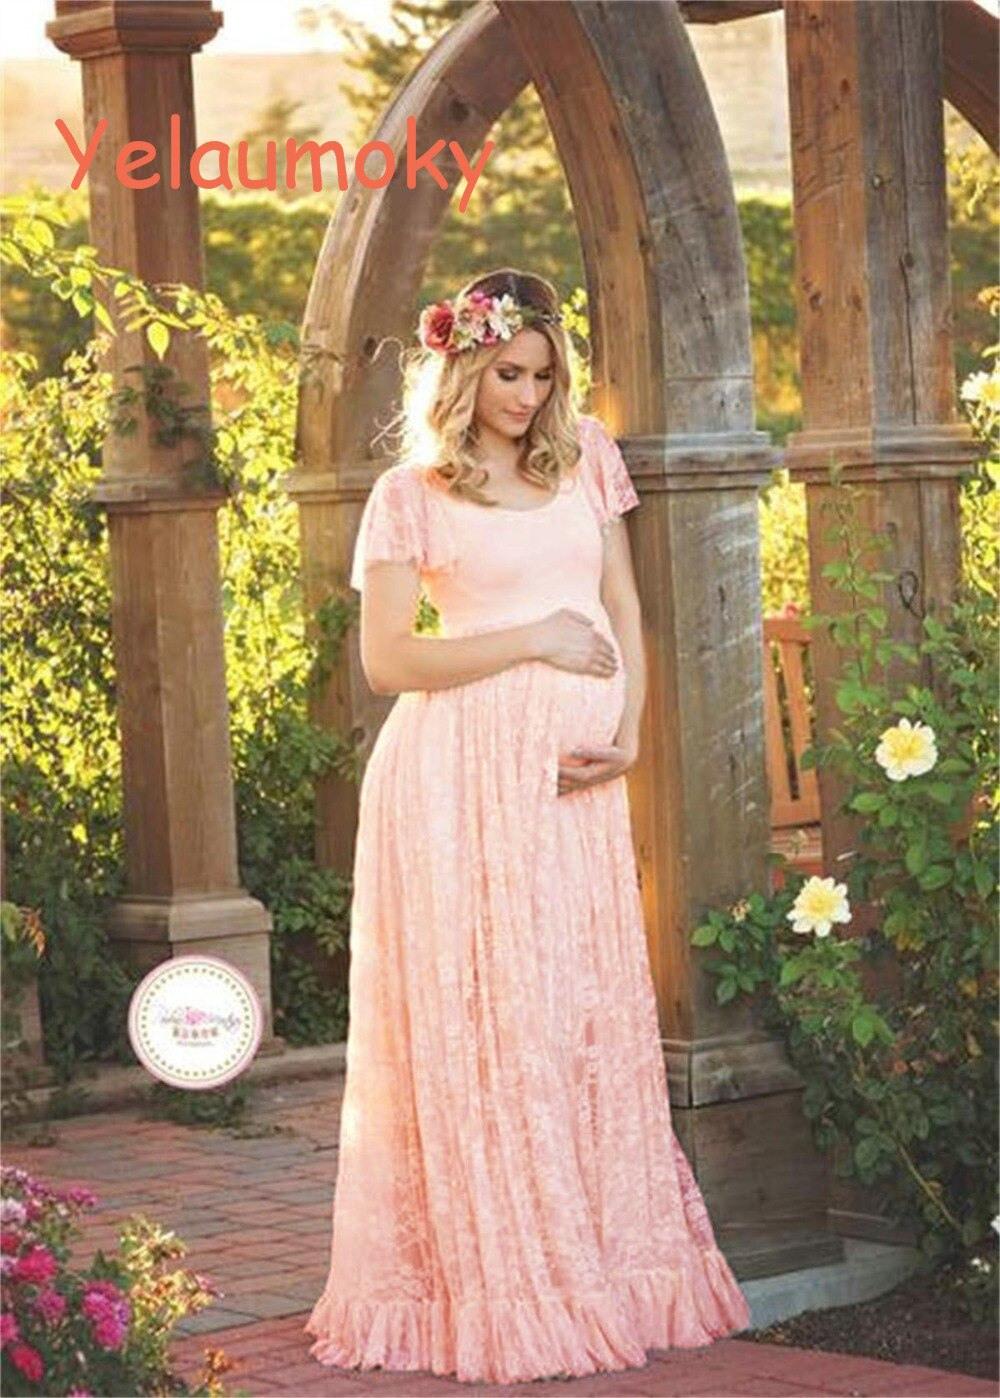 Schwangerschaft Spitze Sommerkleid Mutterschaft Fotografie